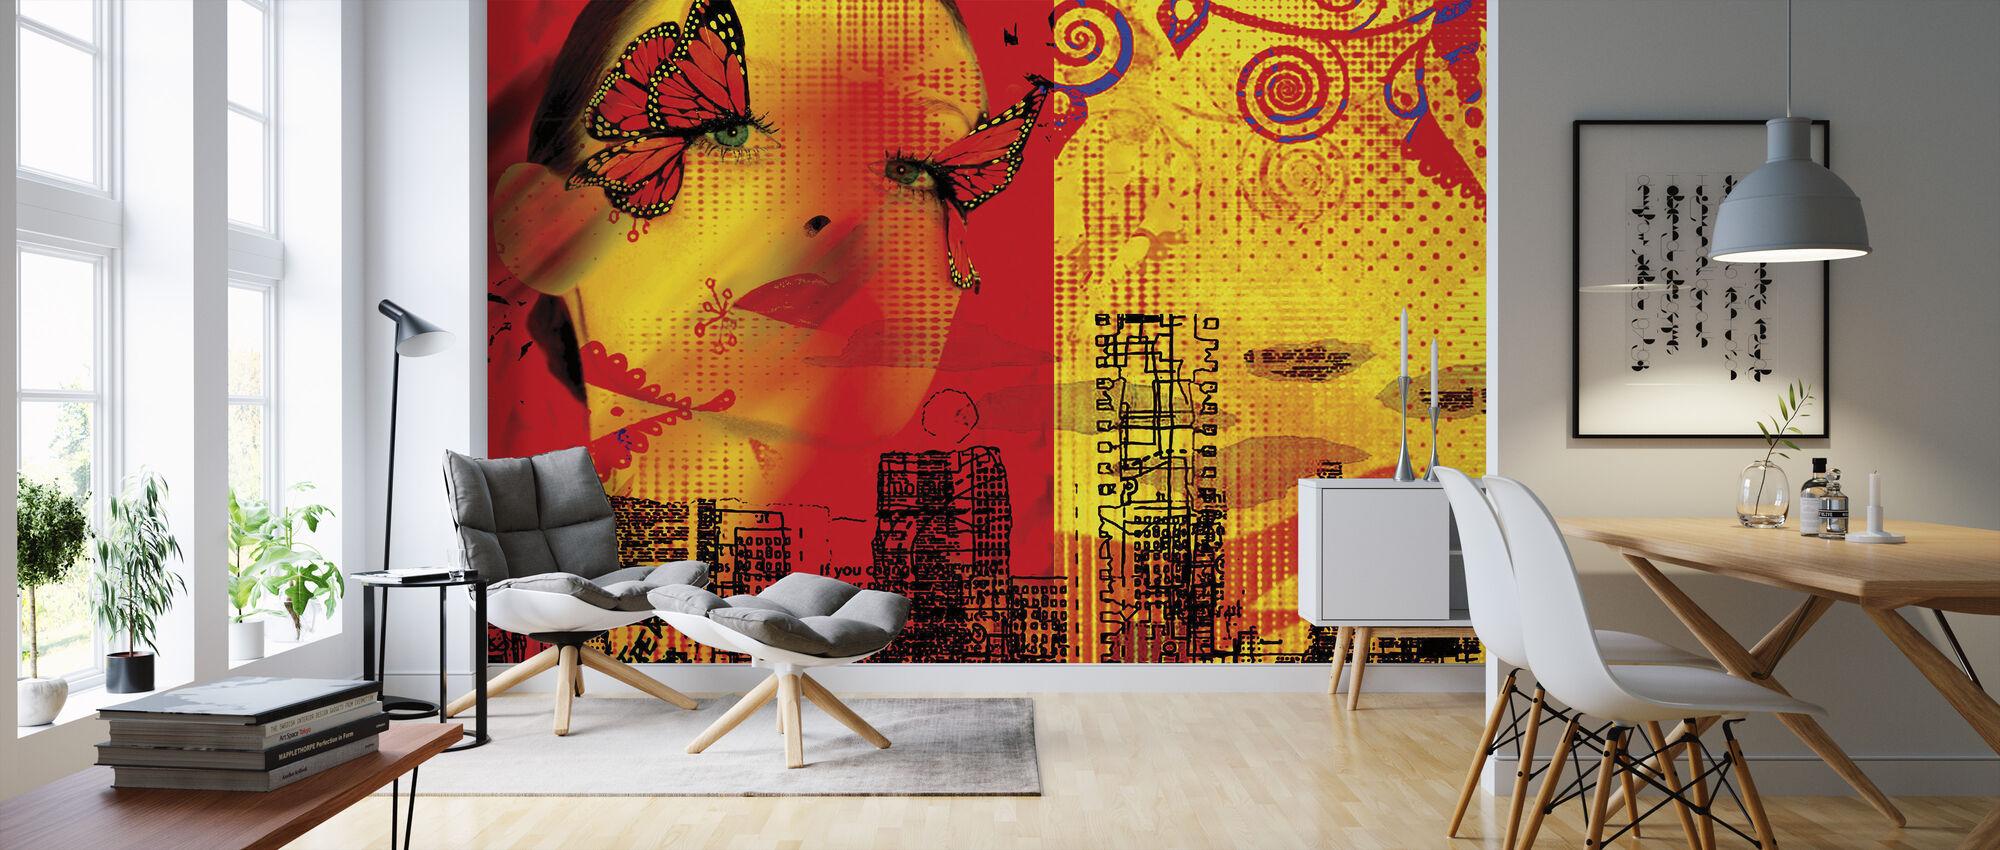 Butterfly - Wallpaper - Living Room